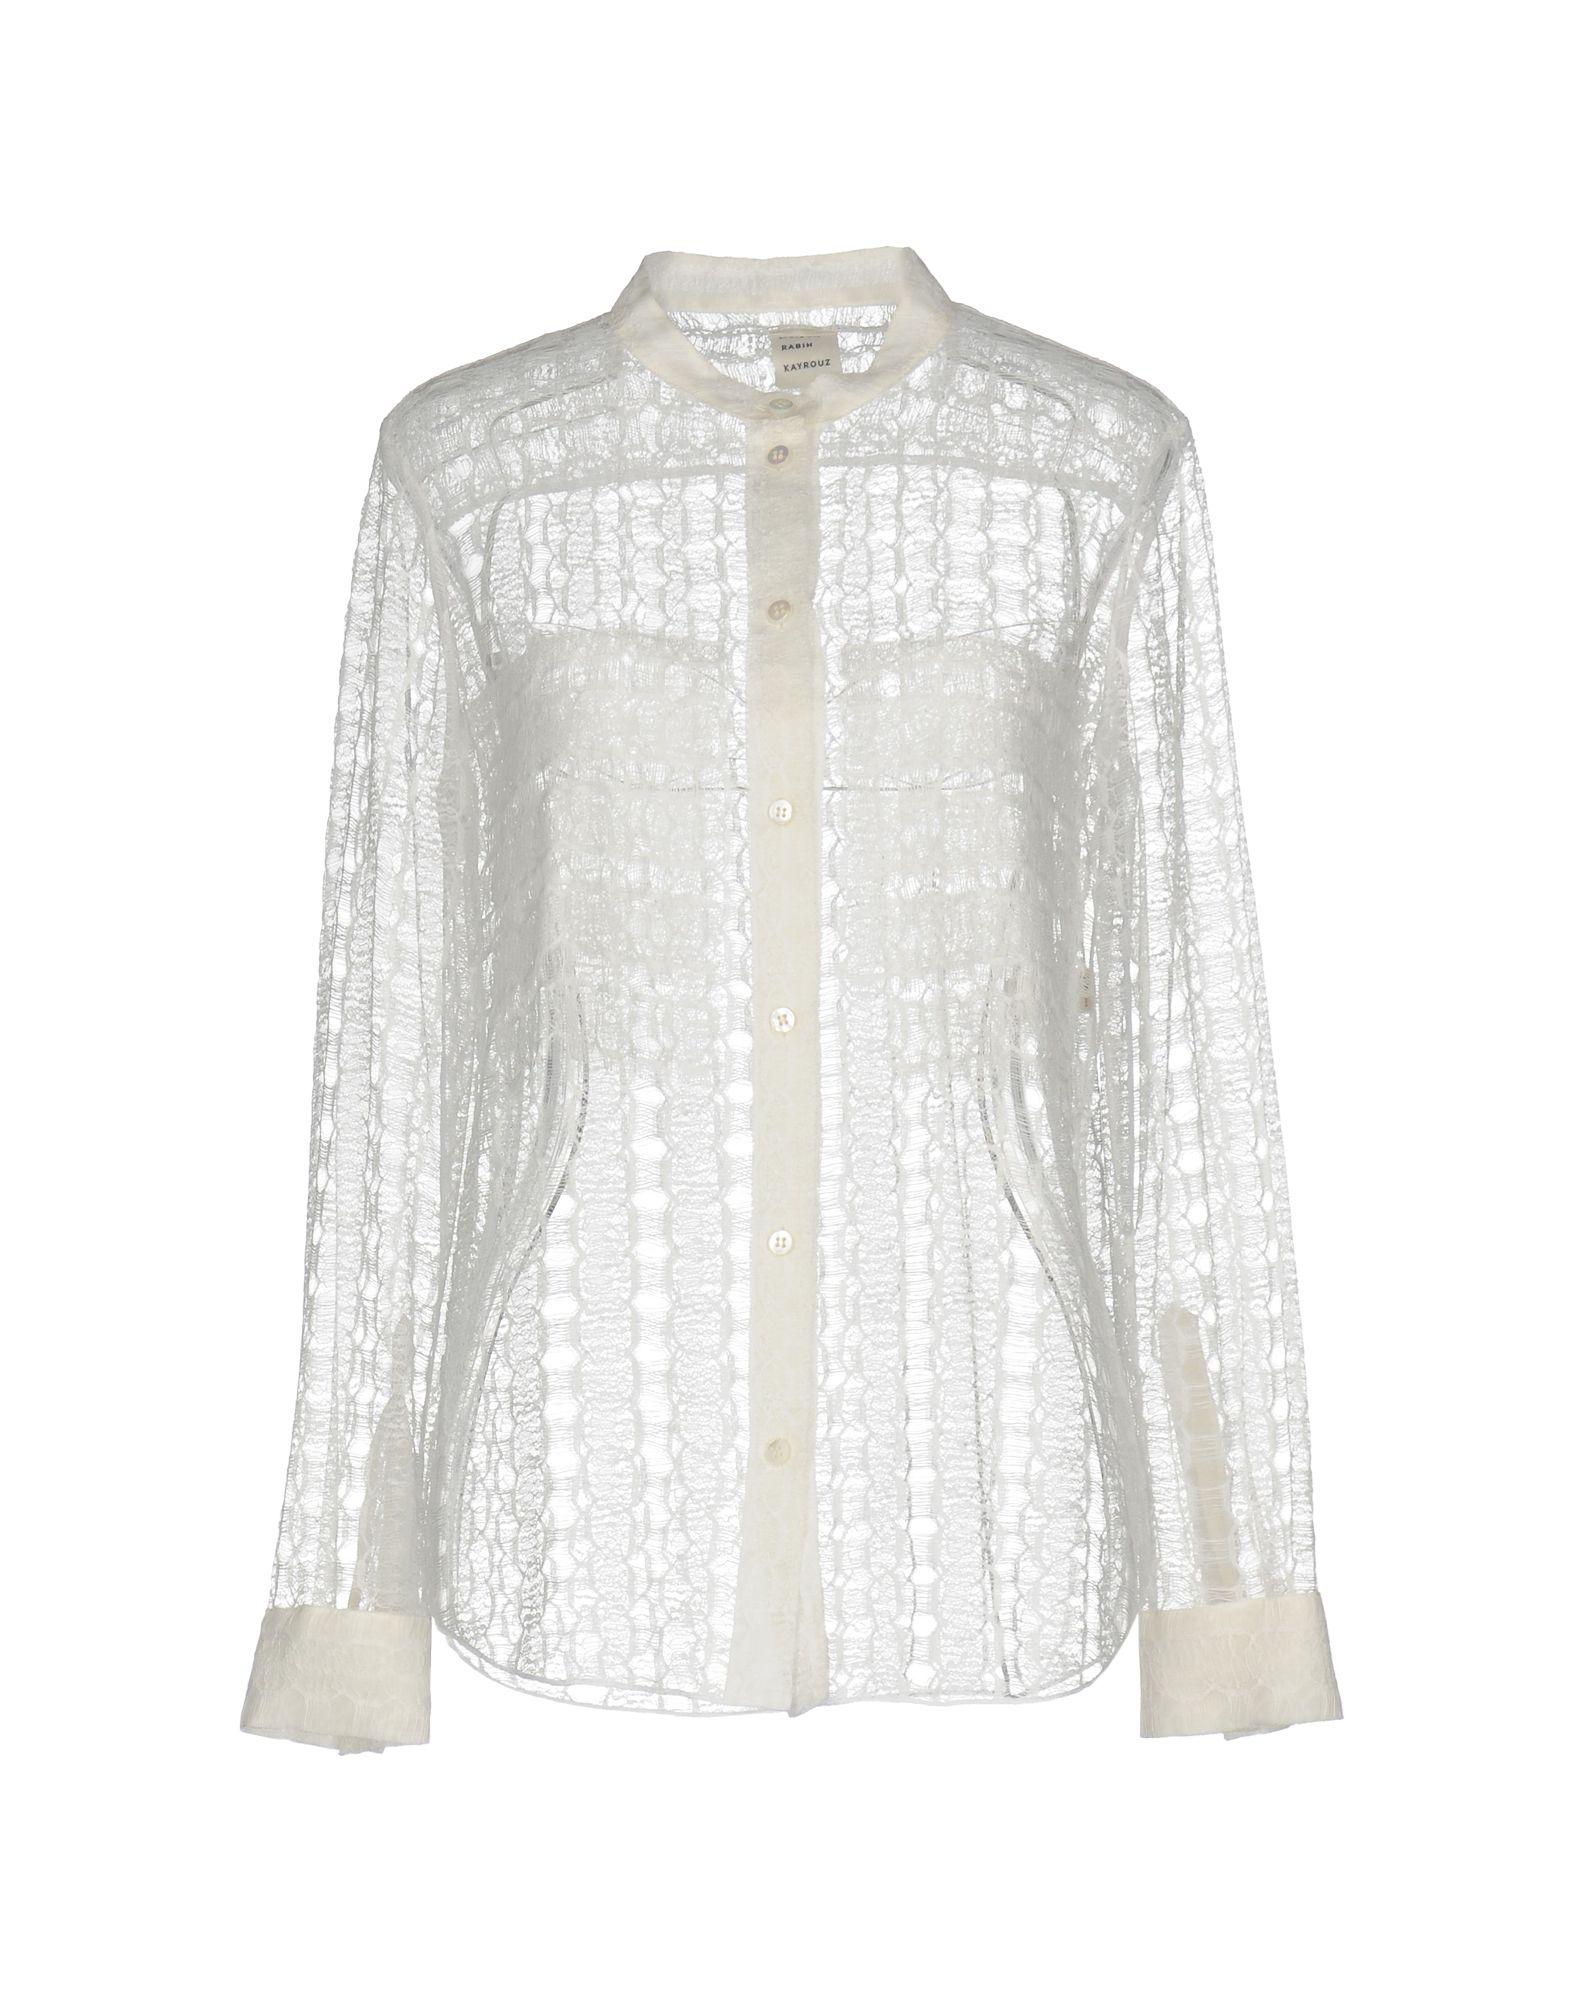 MAISON RABIH KAYROUZ Damen Hemd Farbe Weiß Größe 5